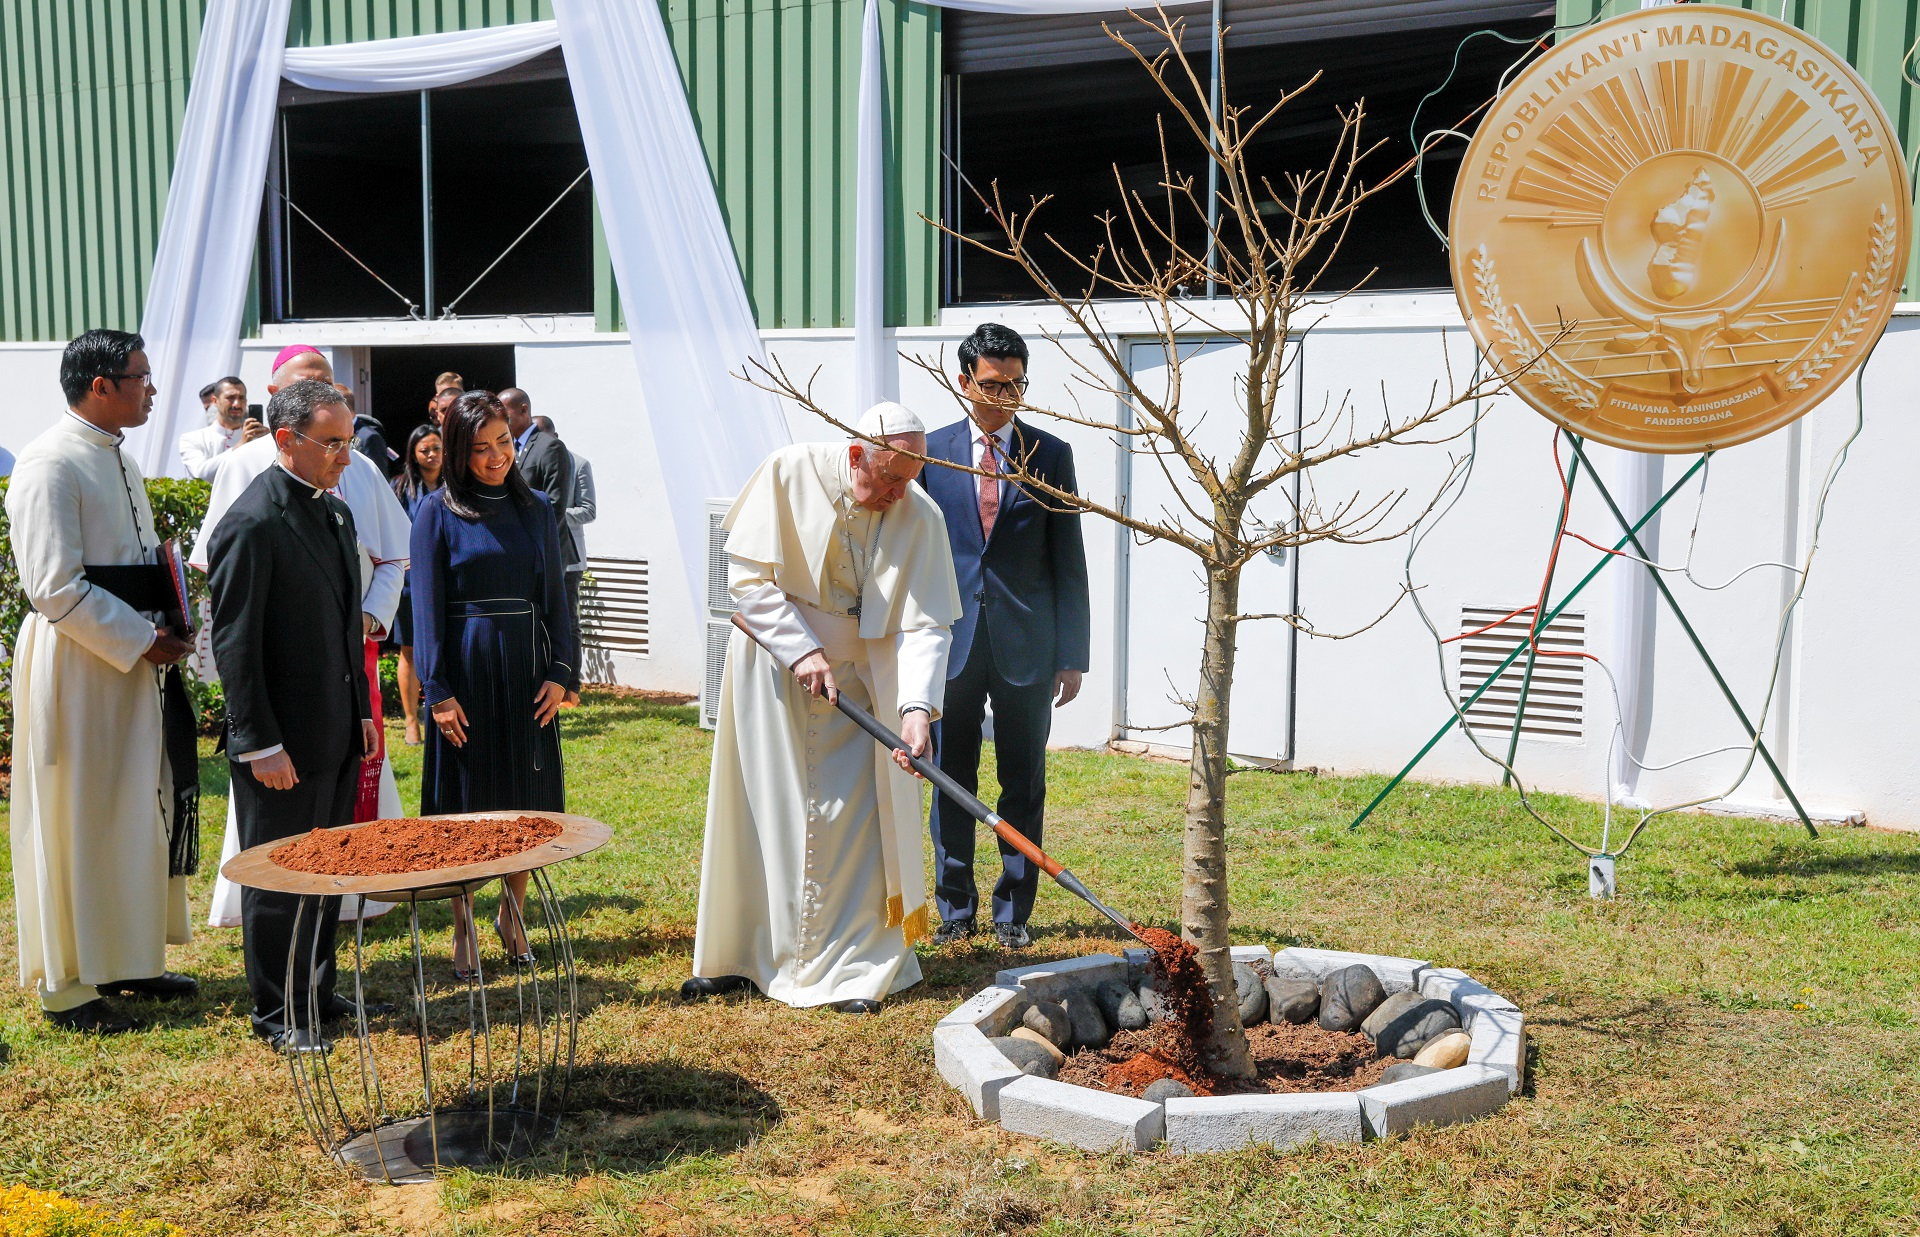 Pope Francis and Madagascar's President Andry Rajoelina attend a symbolic planting of a baobab tree at Iavoloha Palace in Antananarivo, Madagascar September 7, 2019.  REUTERS/Baz Ratner